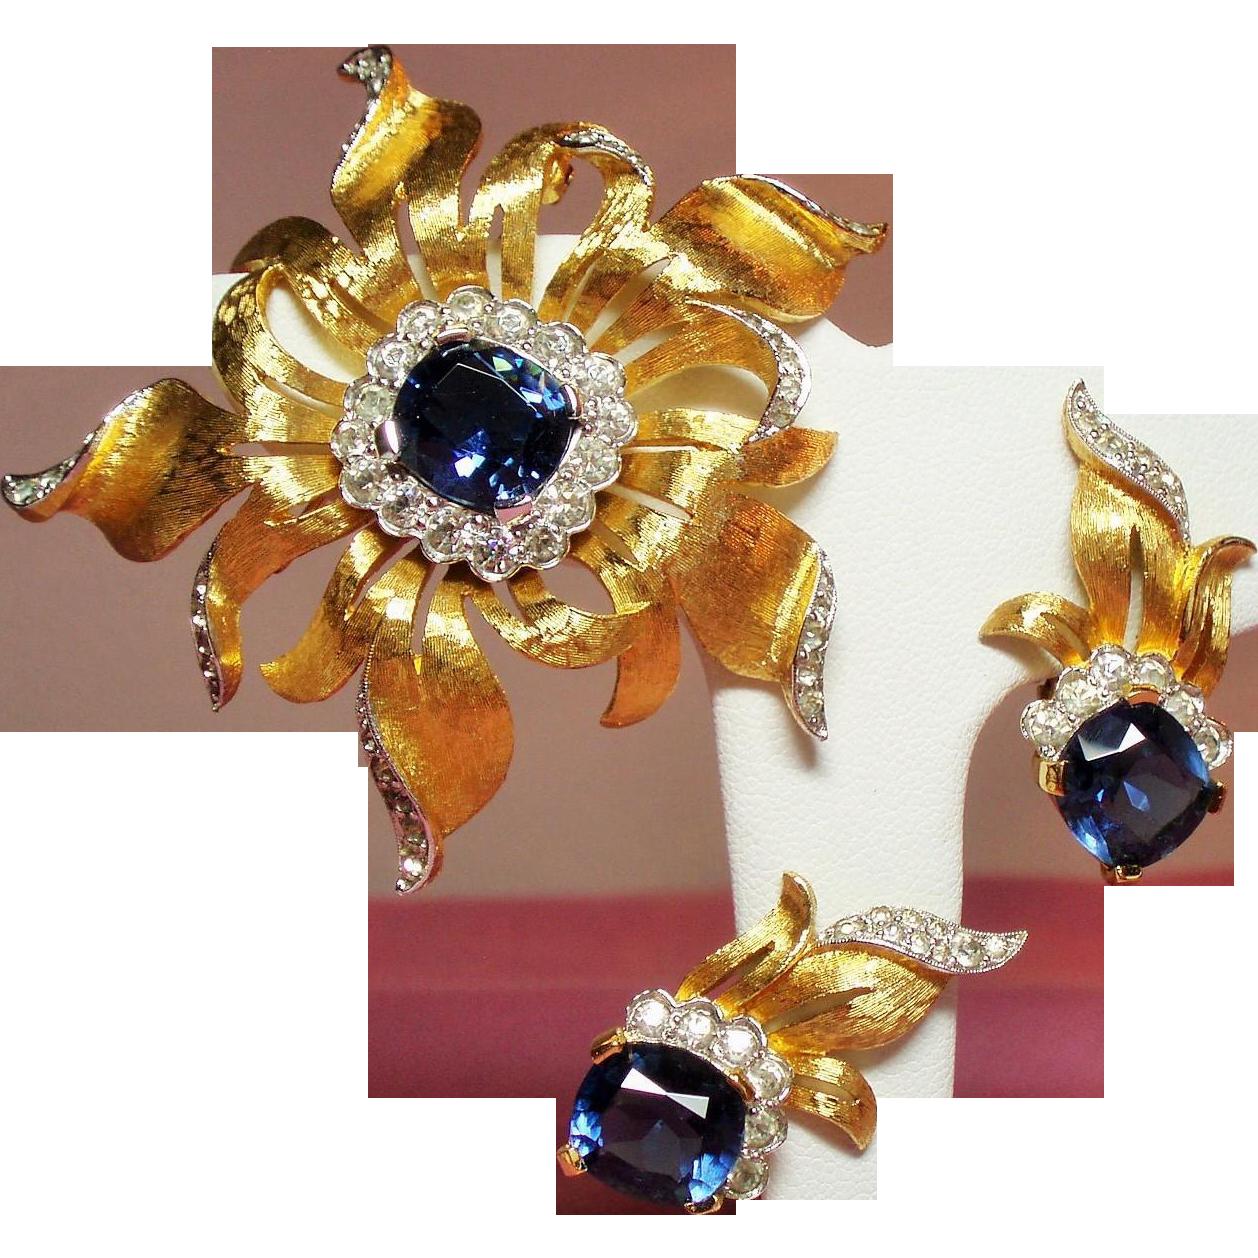 Vintage Jomaz Cushion Cut Faux Sapphire Diamante Brooch Earrings Demi Parure.